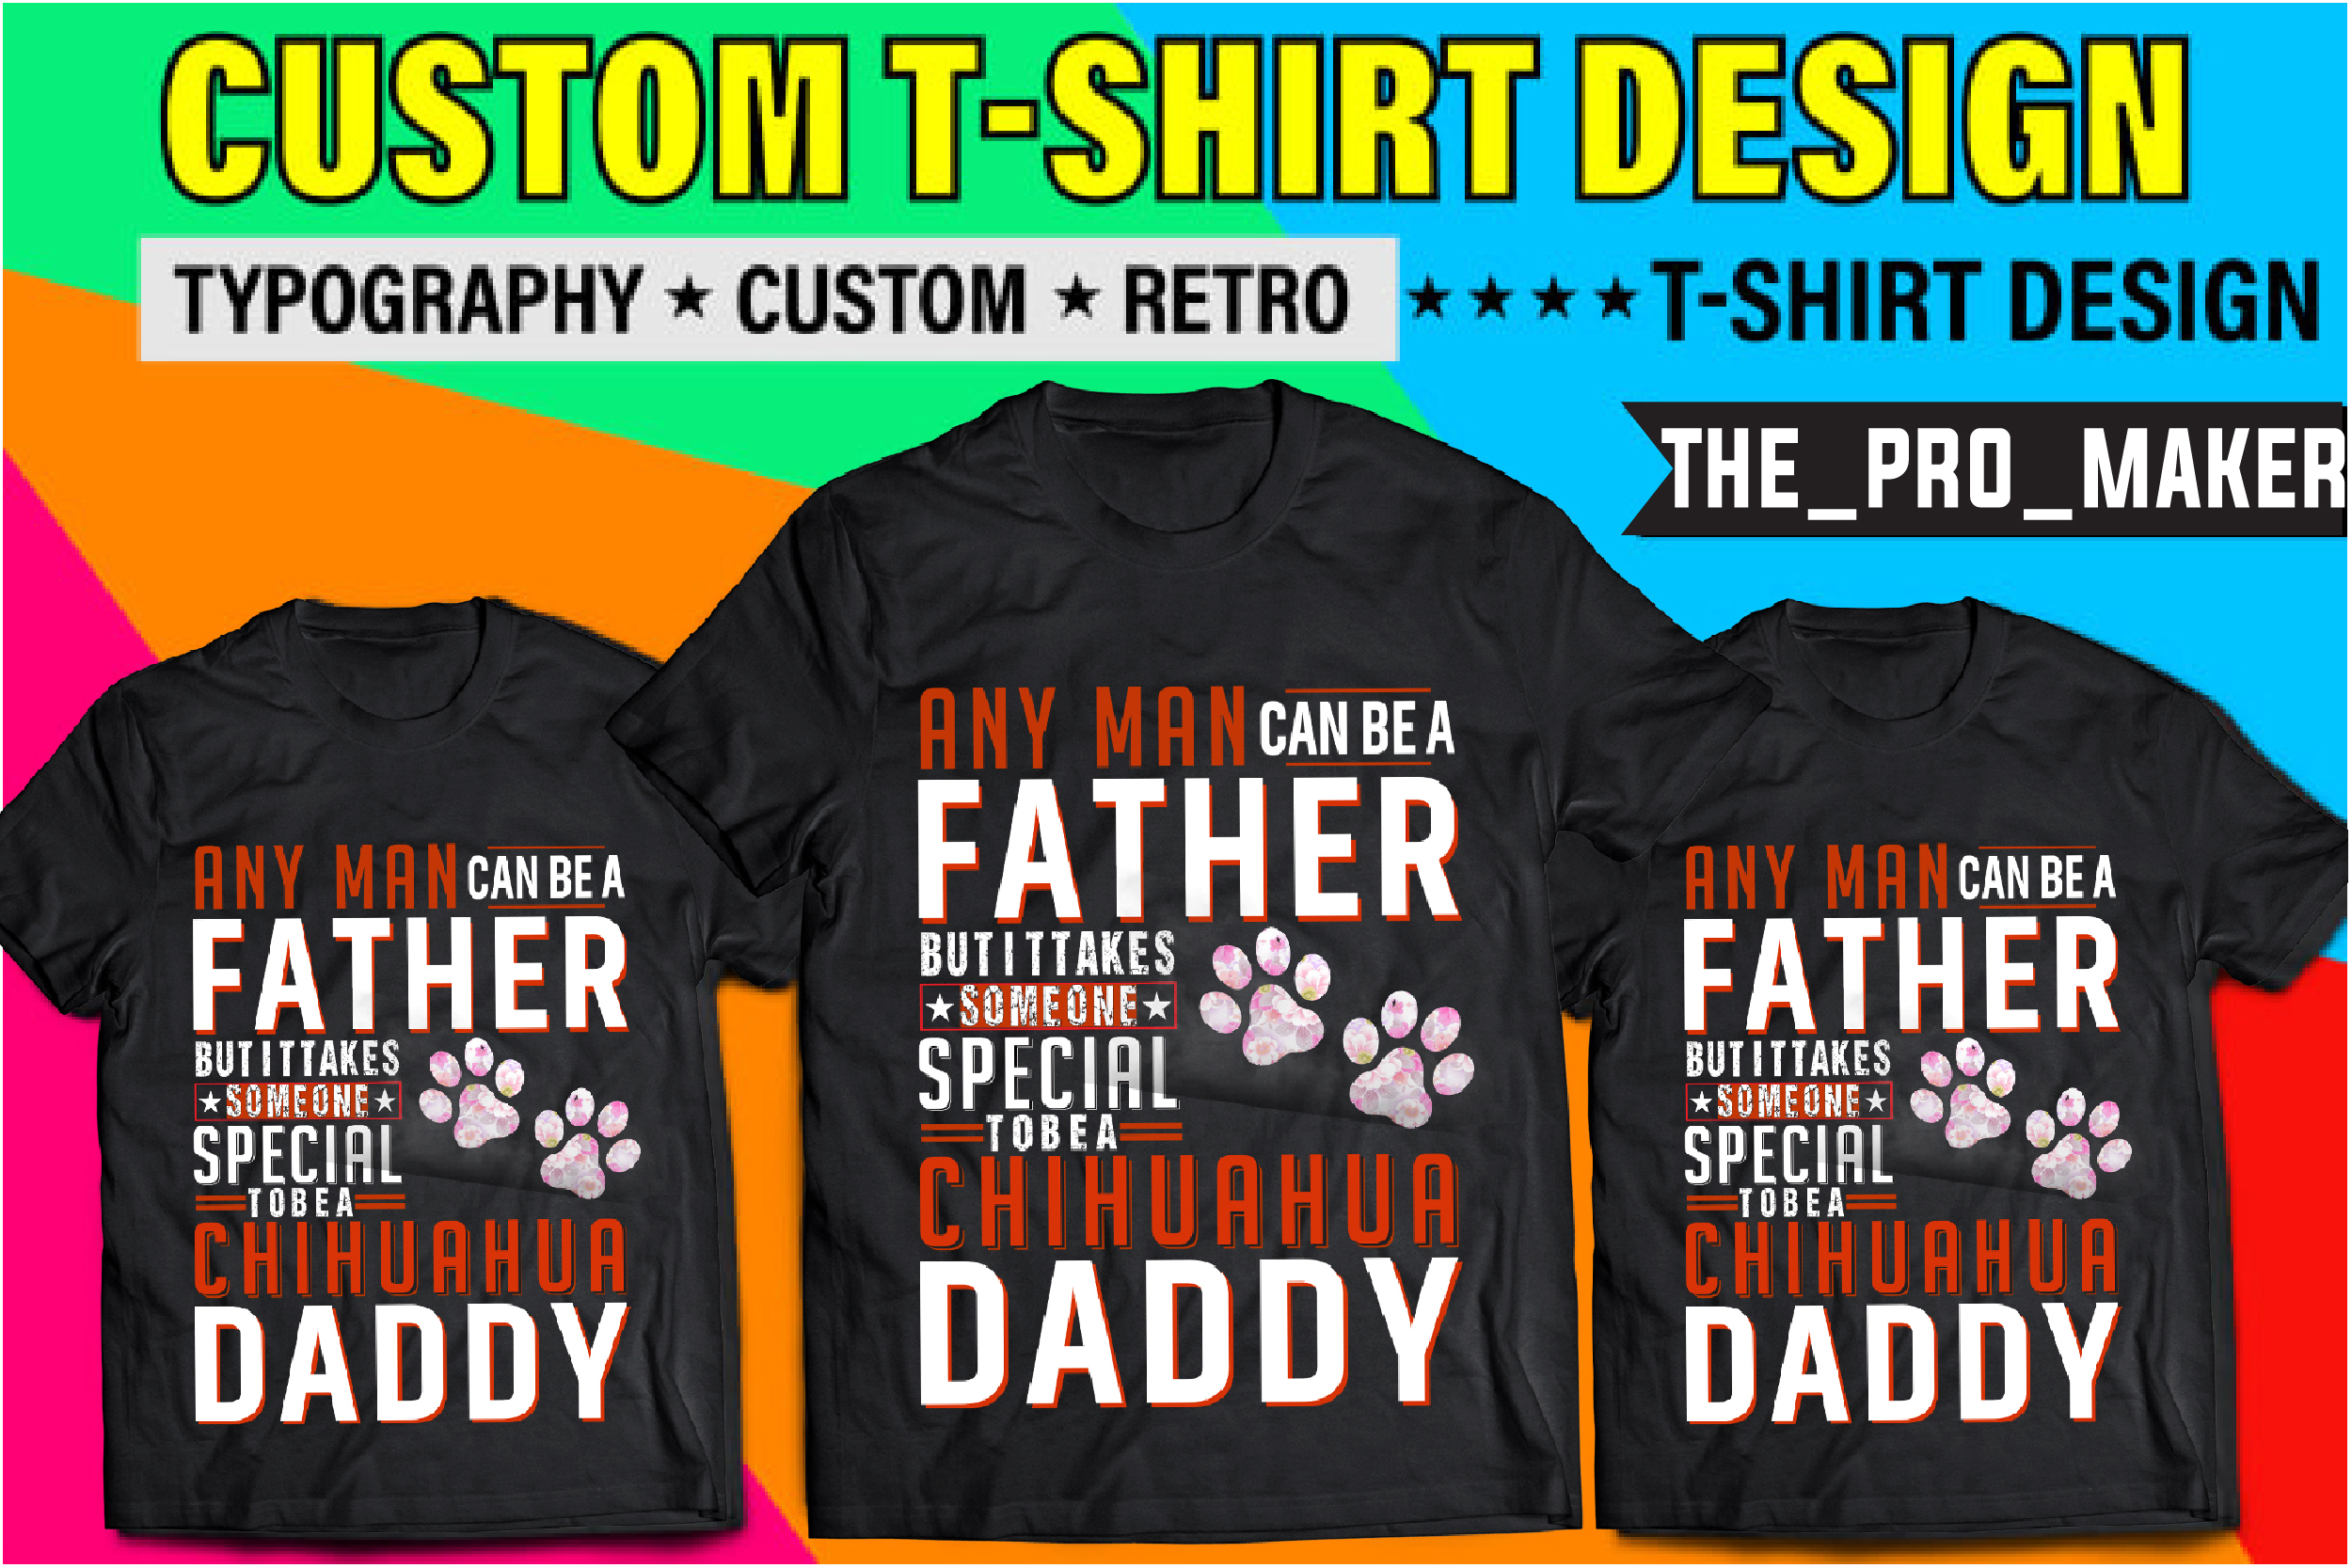 I will do custom t shirt design or bulk t shirt designs within 5h